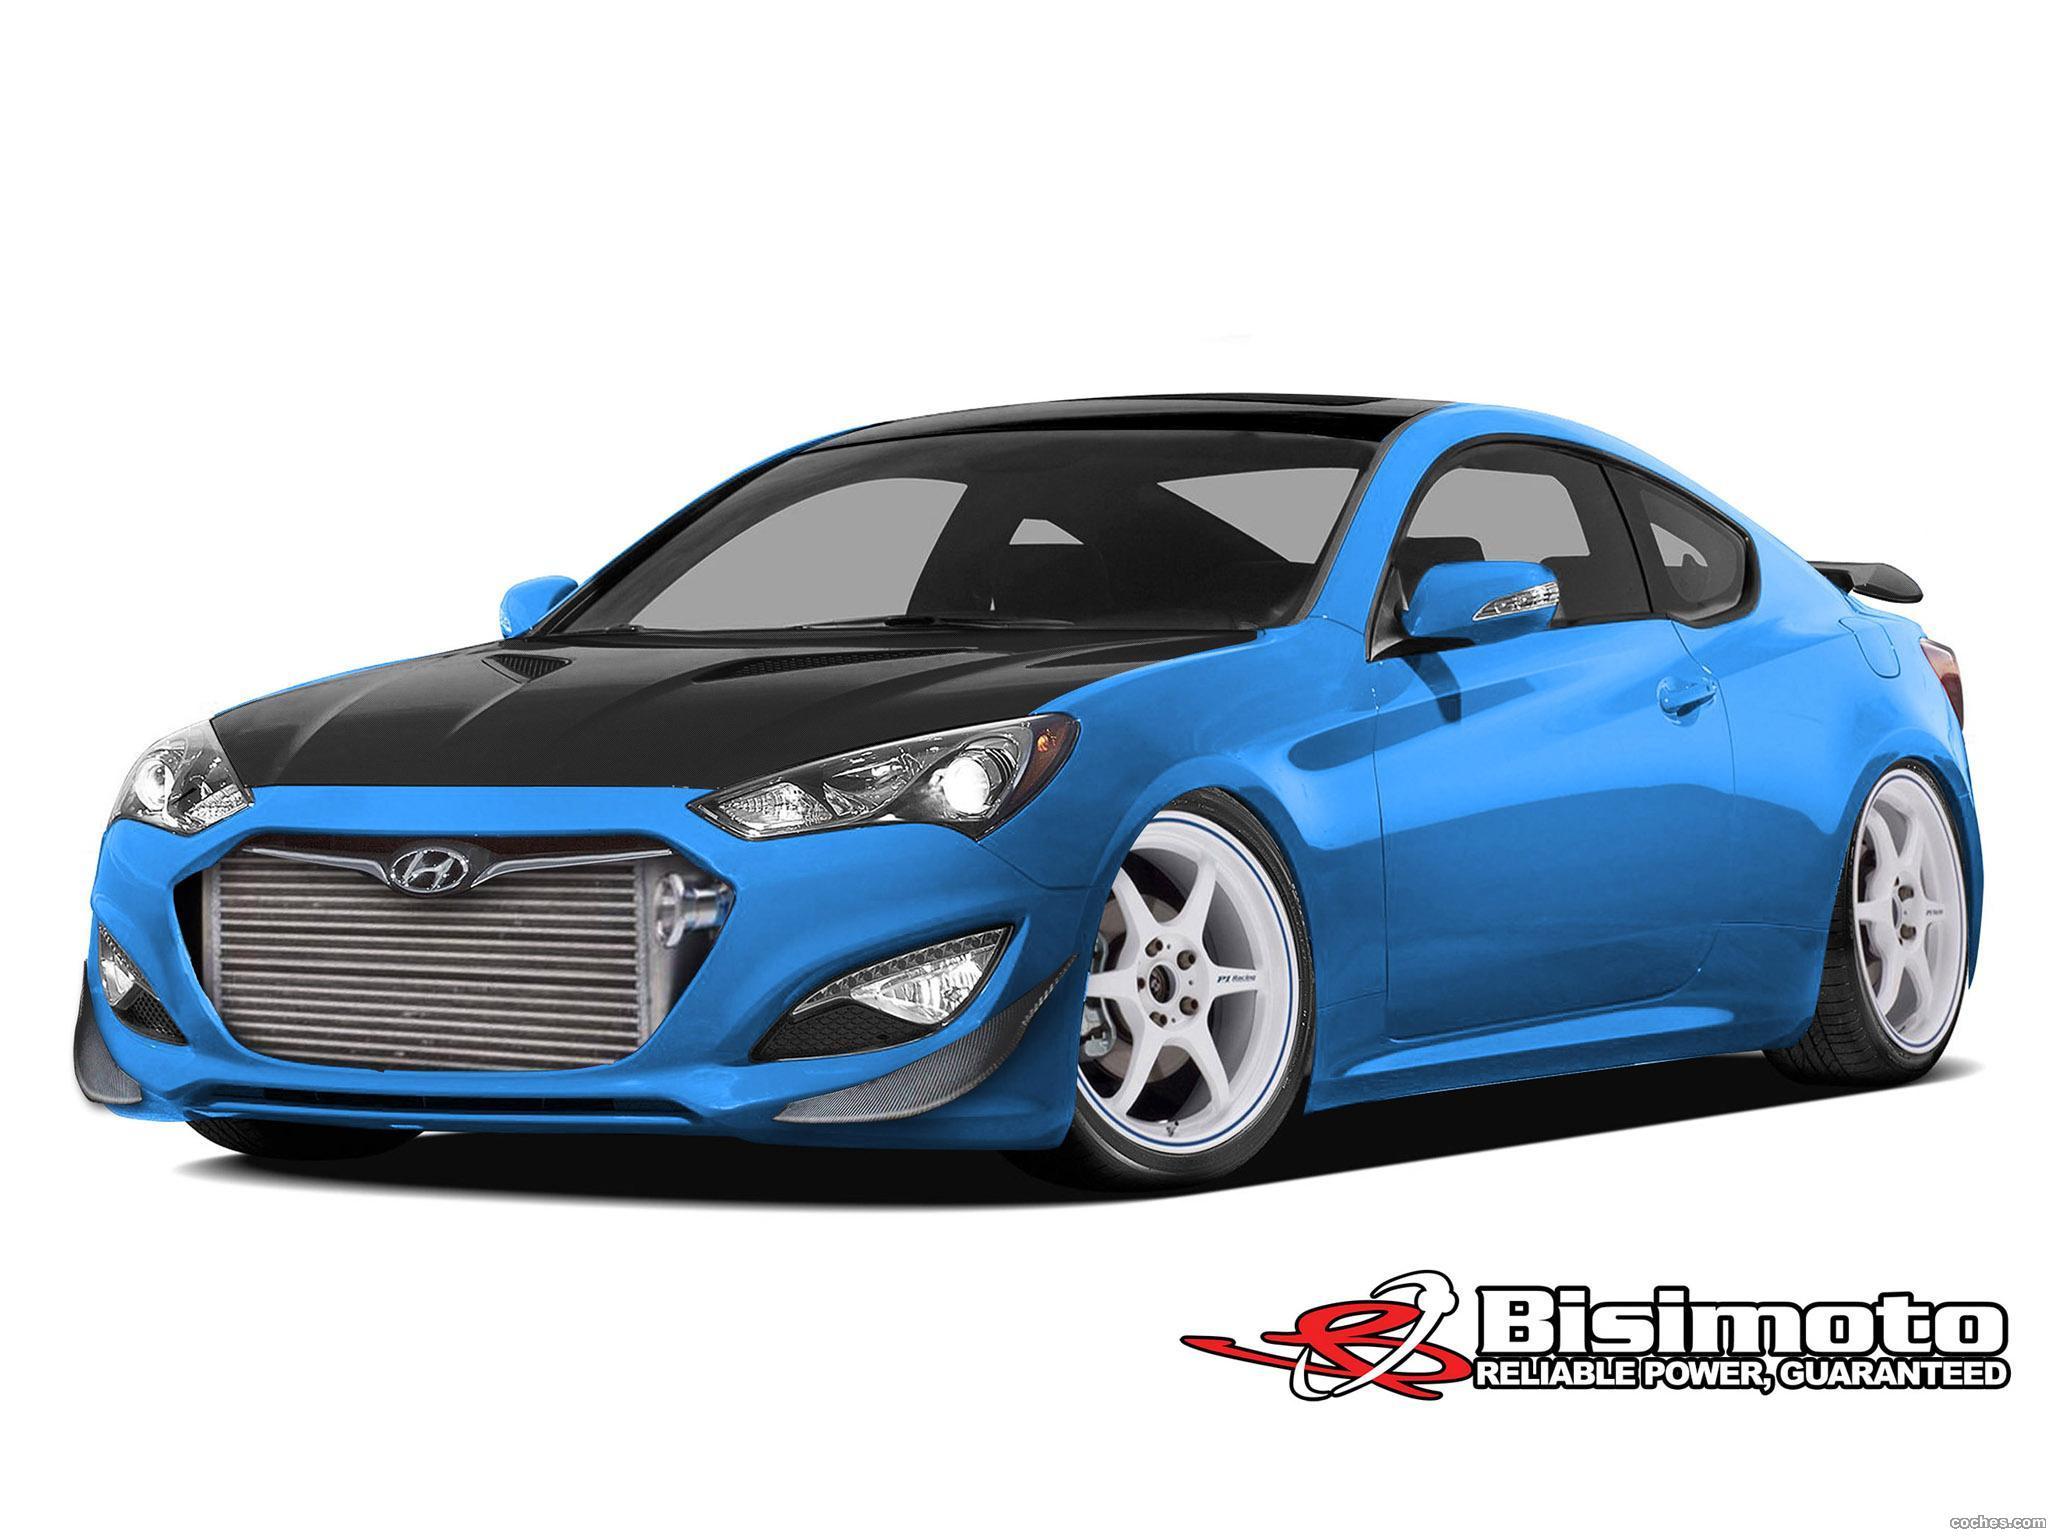 Foto 0 de Hyundai Genesis Coupe Bisimoto 2013